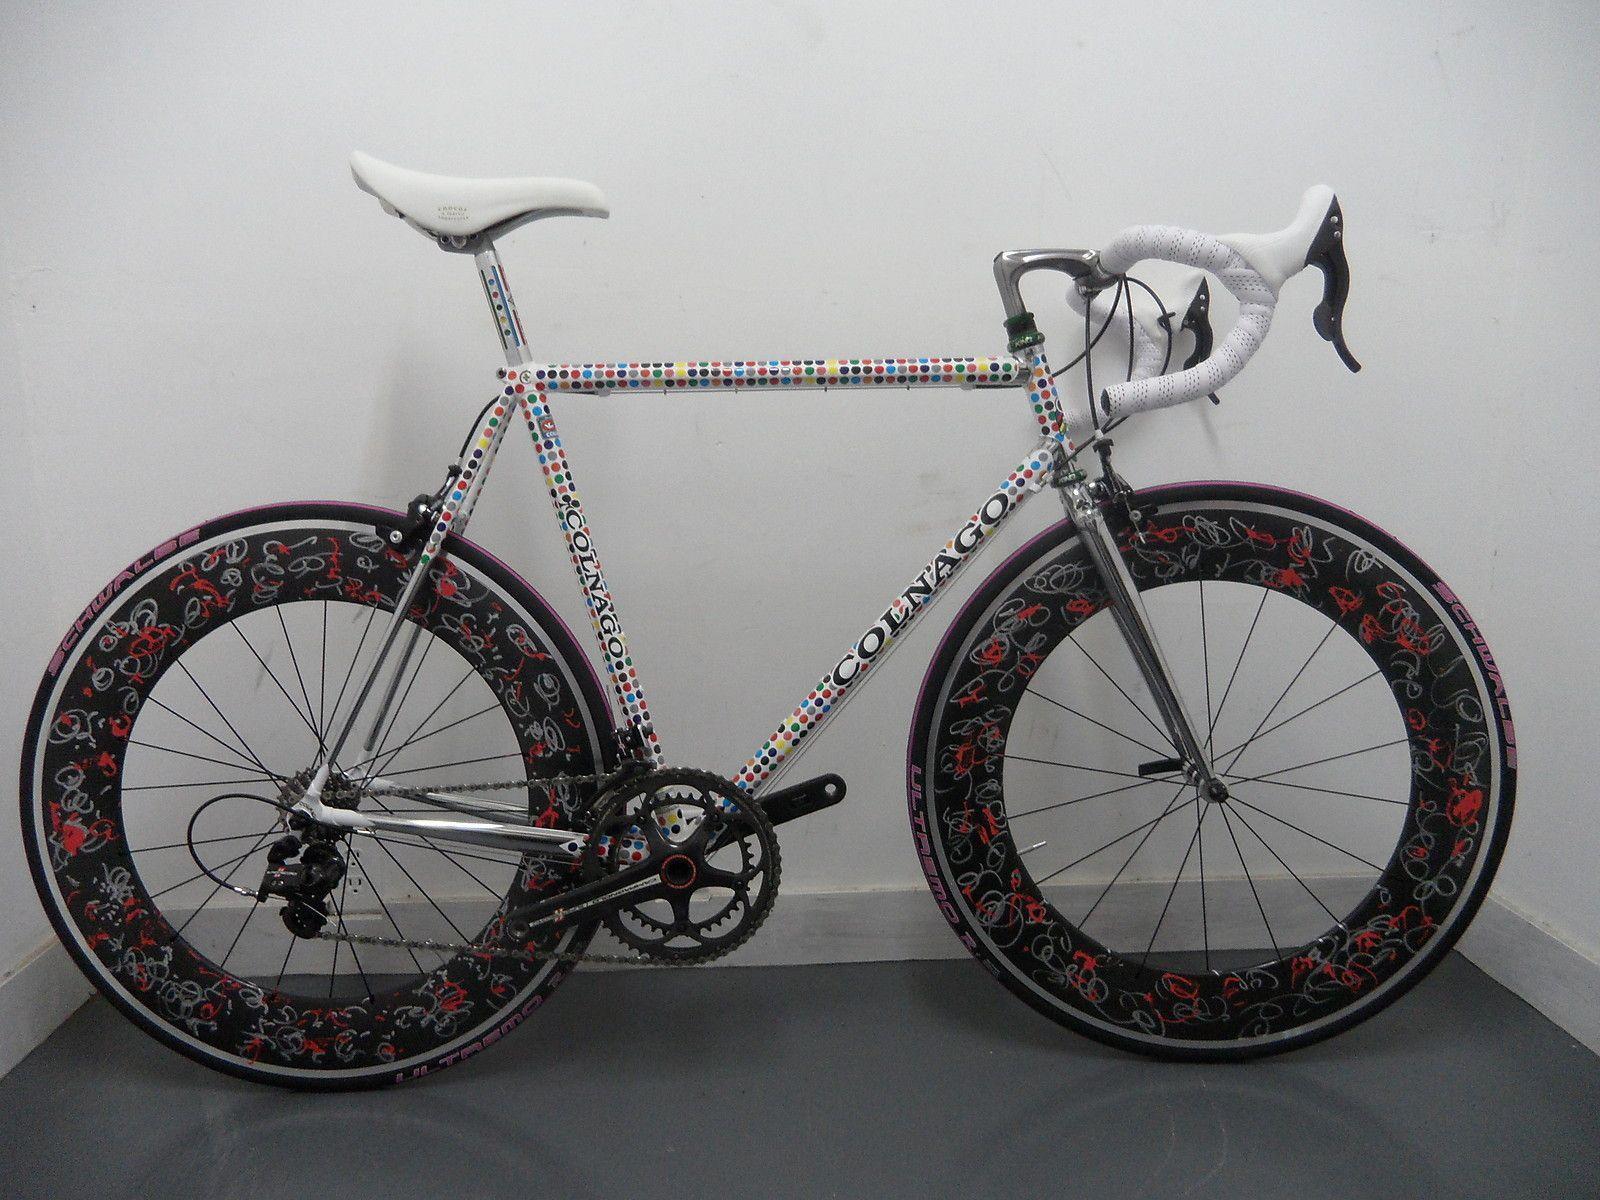 Futura 2000 Colnago Prototype Road Bike 57cm with Original Artwork Wheel Set   eBay